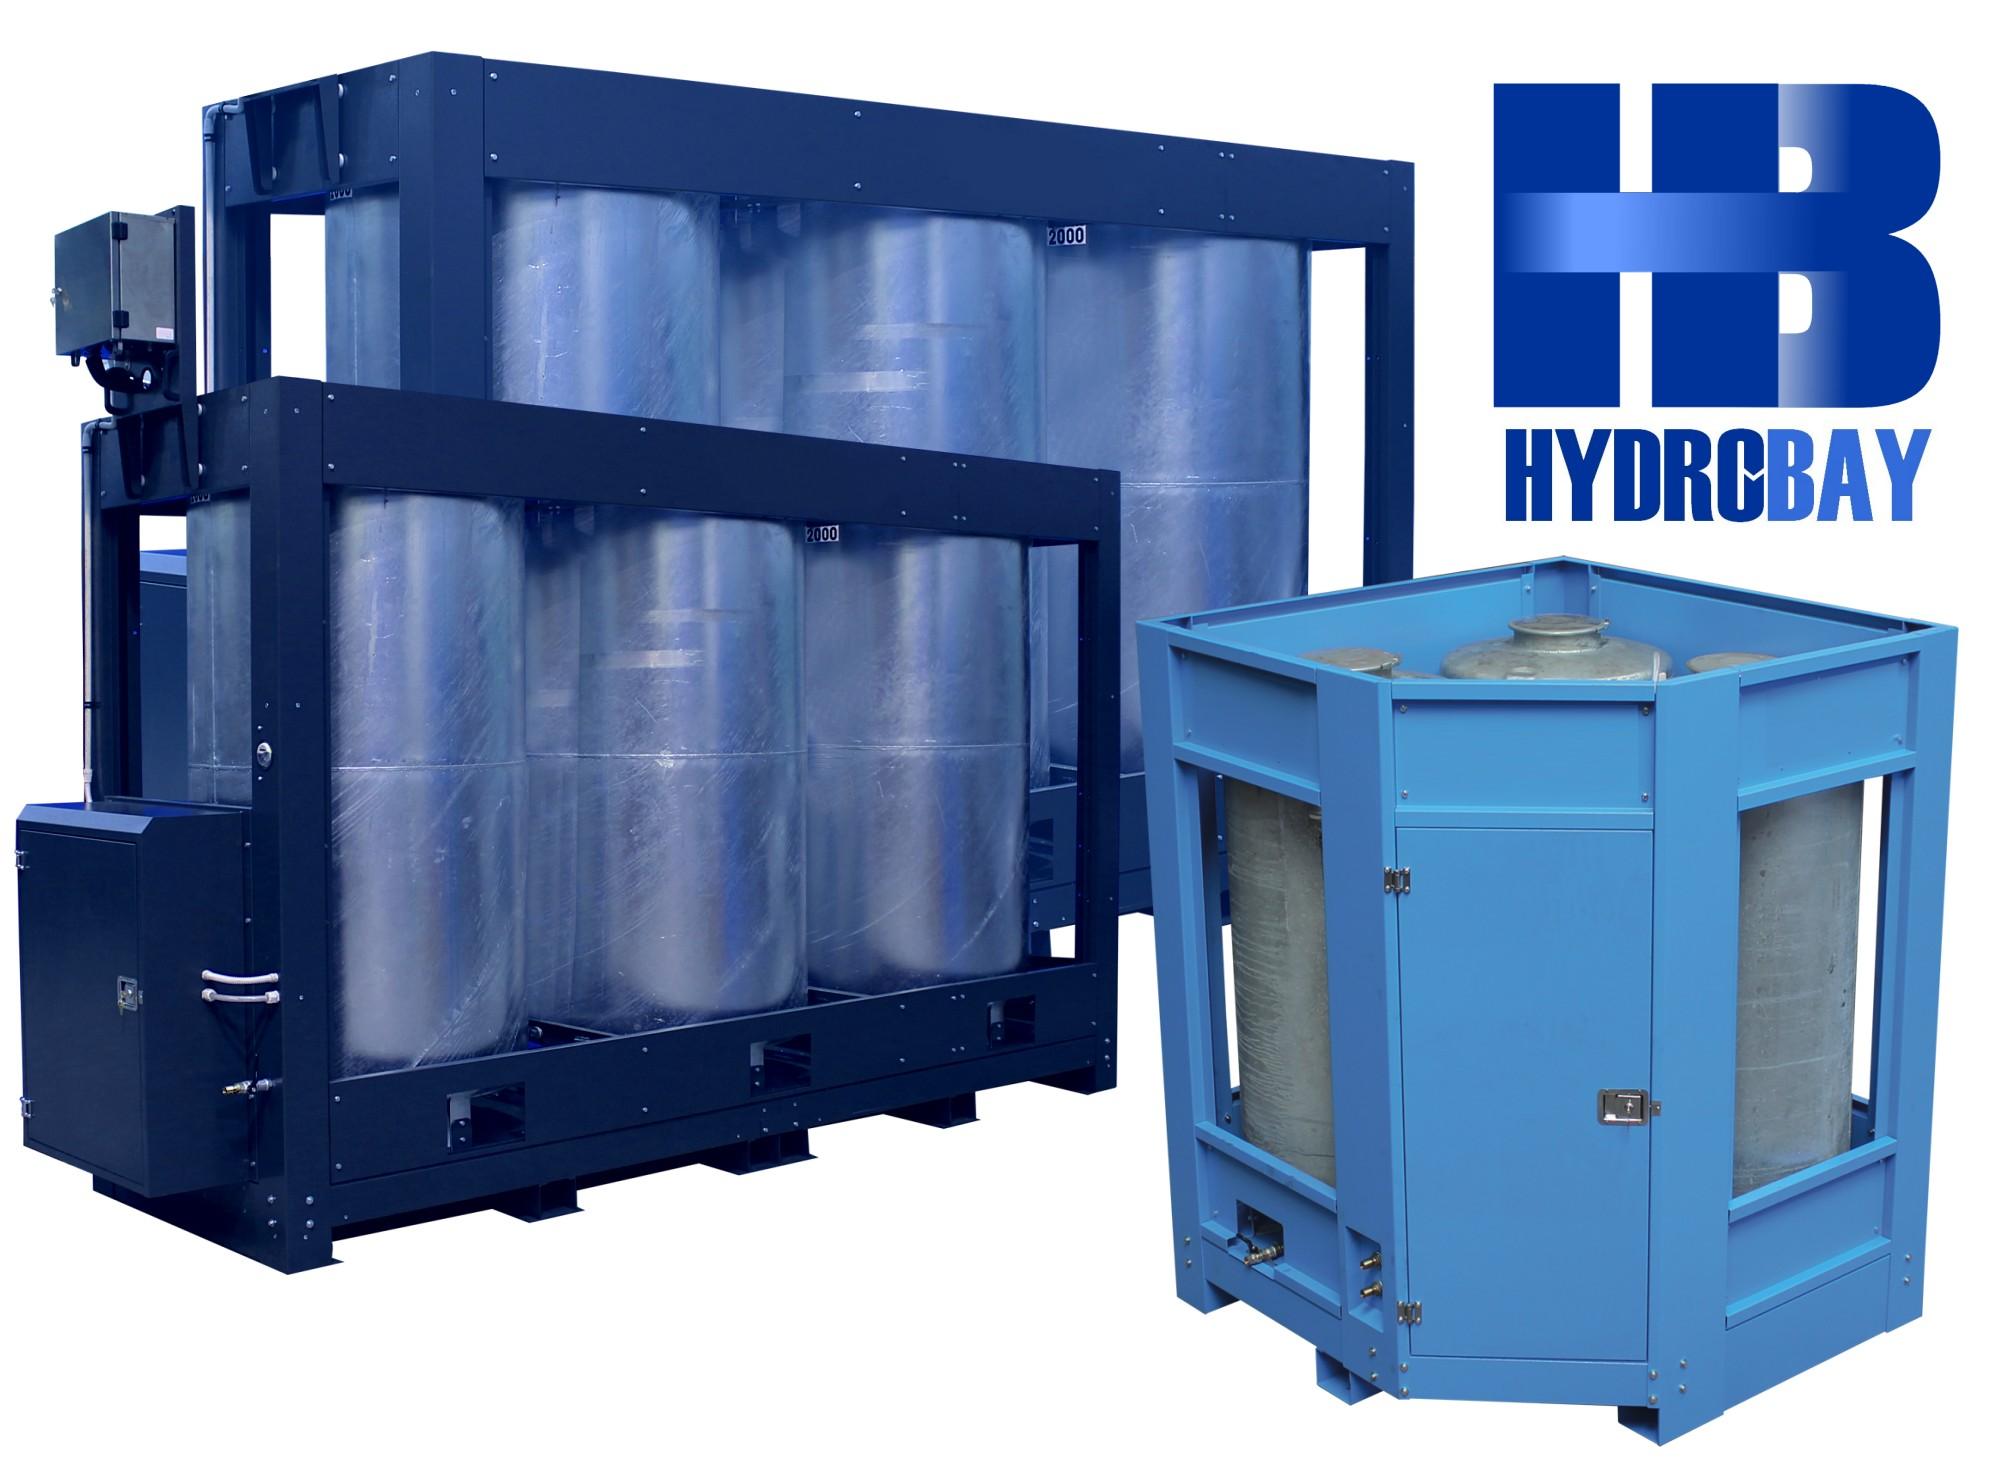 depuratore Hydrobay